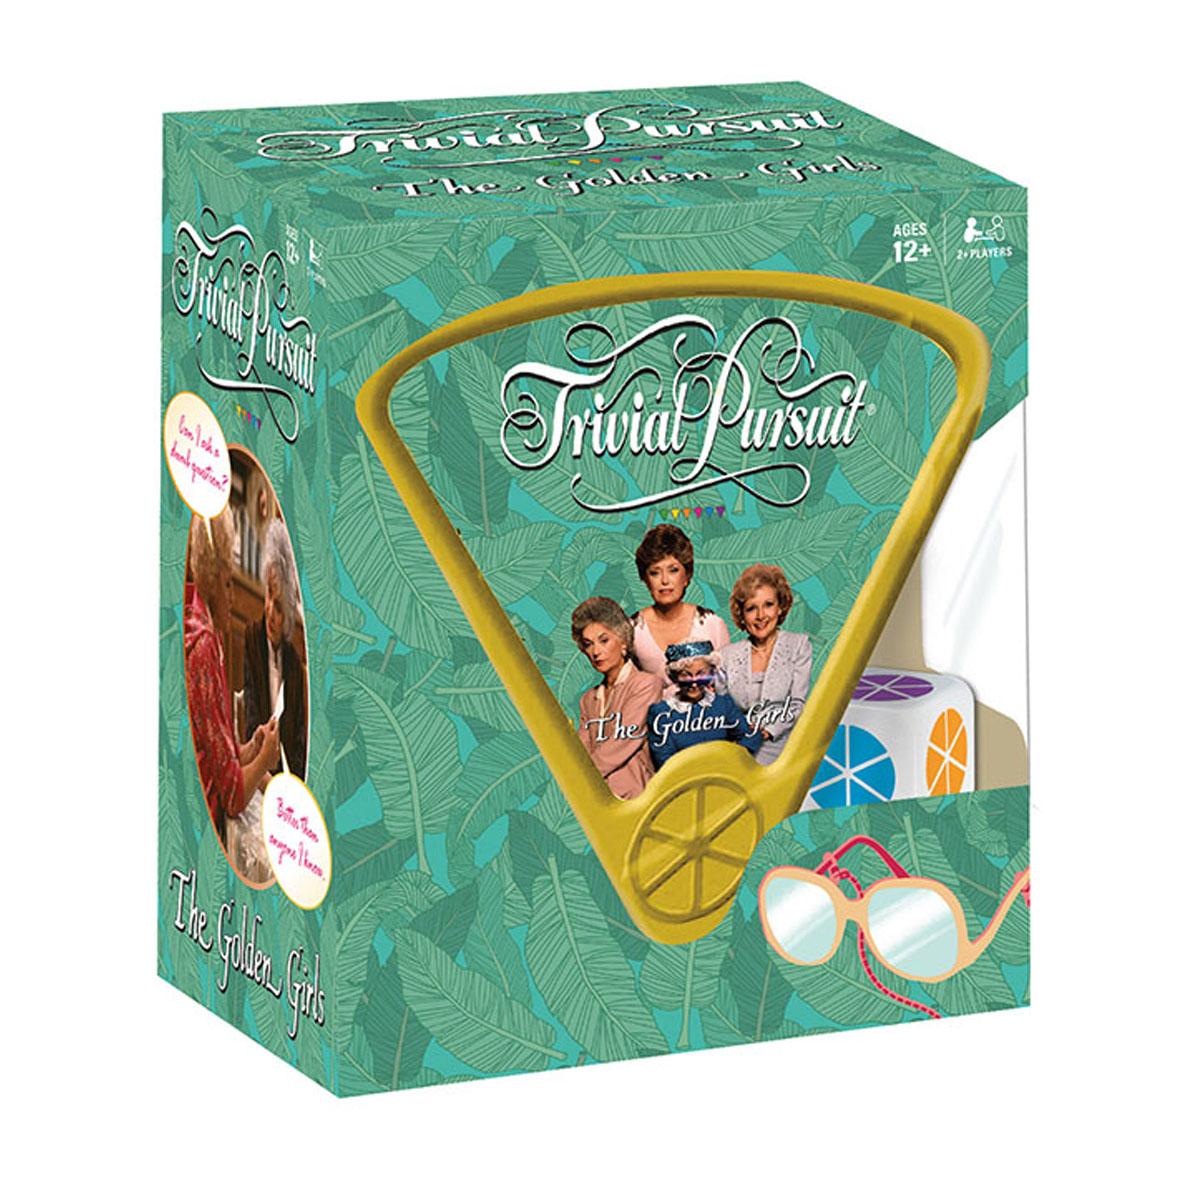 The Golden Girls Trivial Pursuit